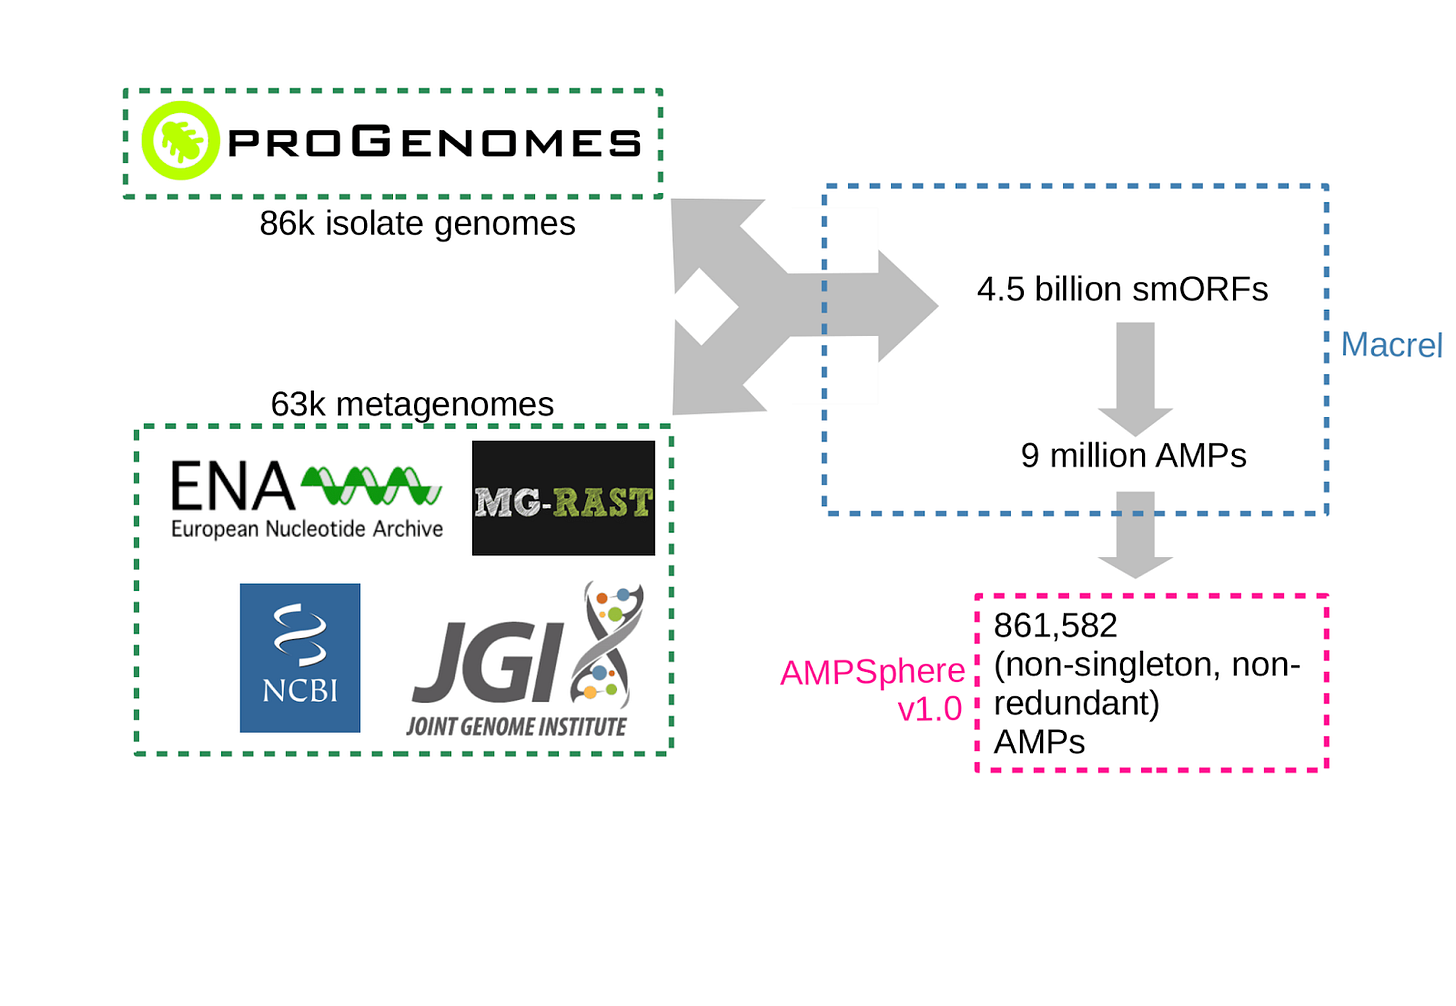 Summary of AMPSphere pipeline